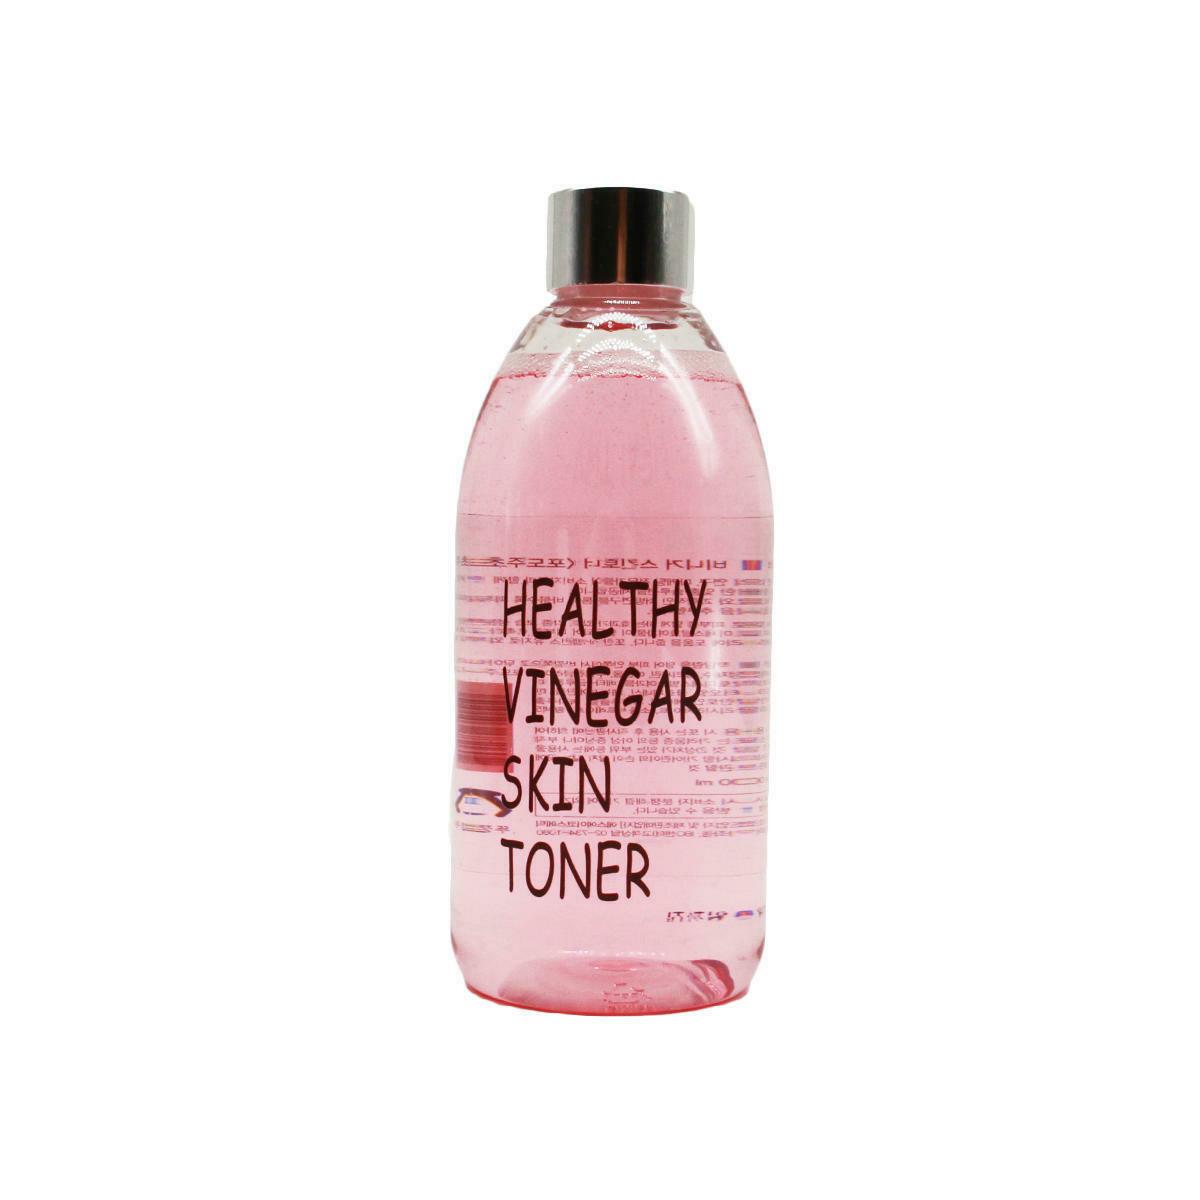 REALSKIN Тонер для лица КРАСНОЕ ВИНО Healthy vinegar skin toner (Grape wine), 300 мл